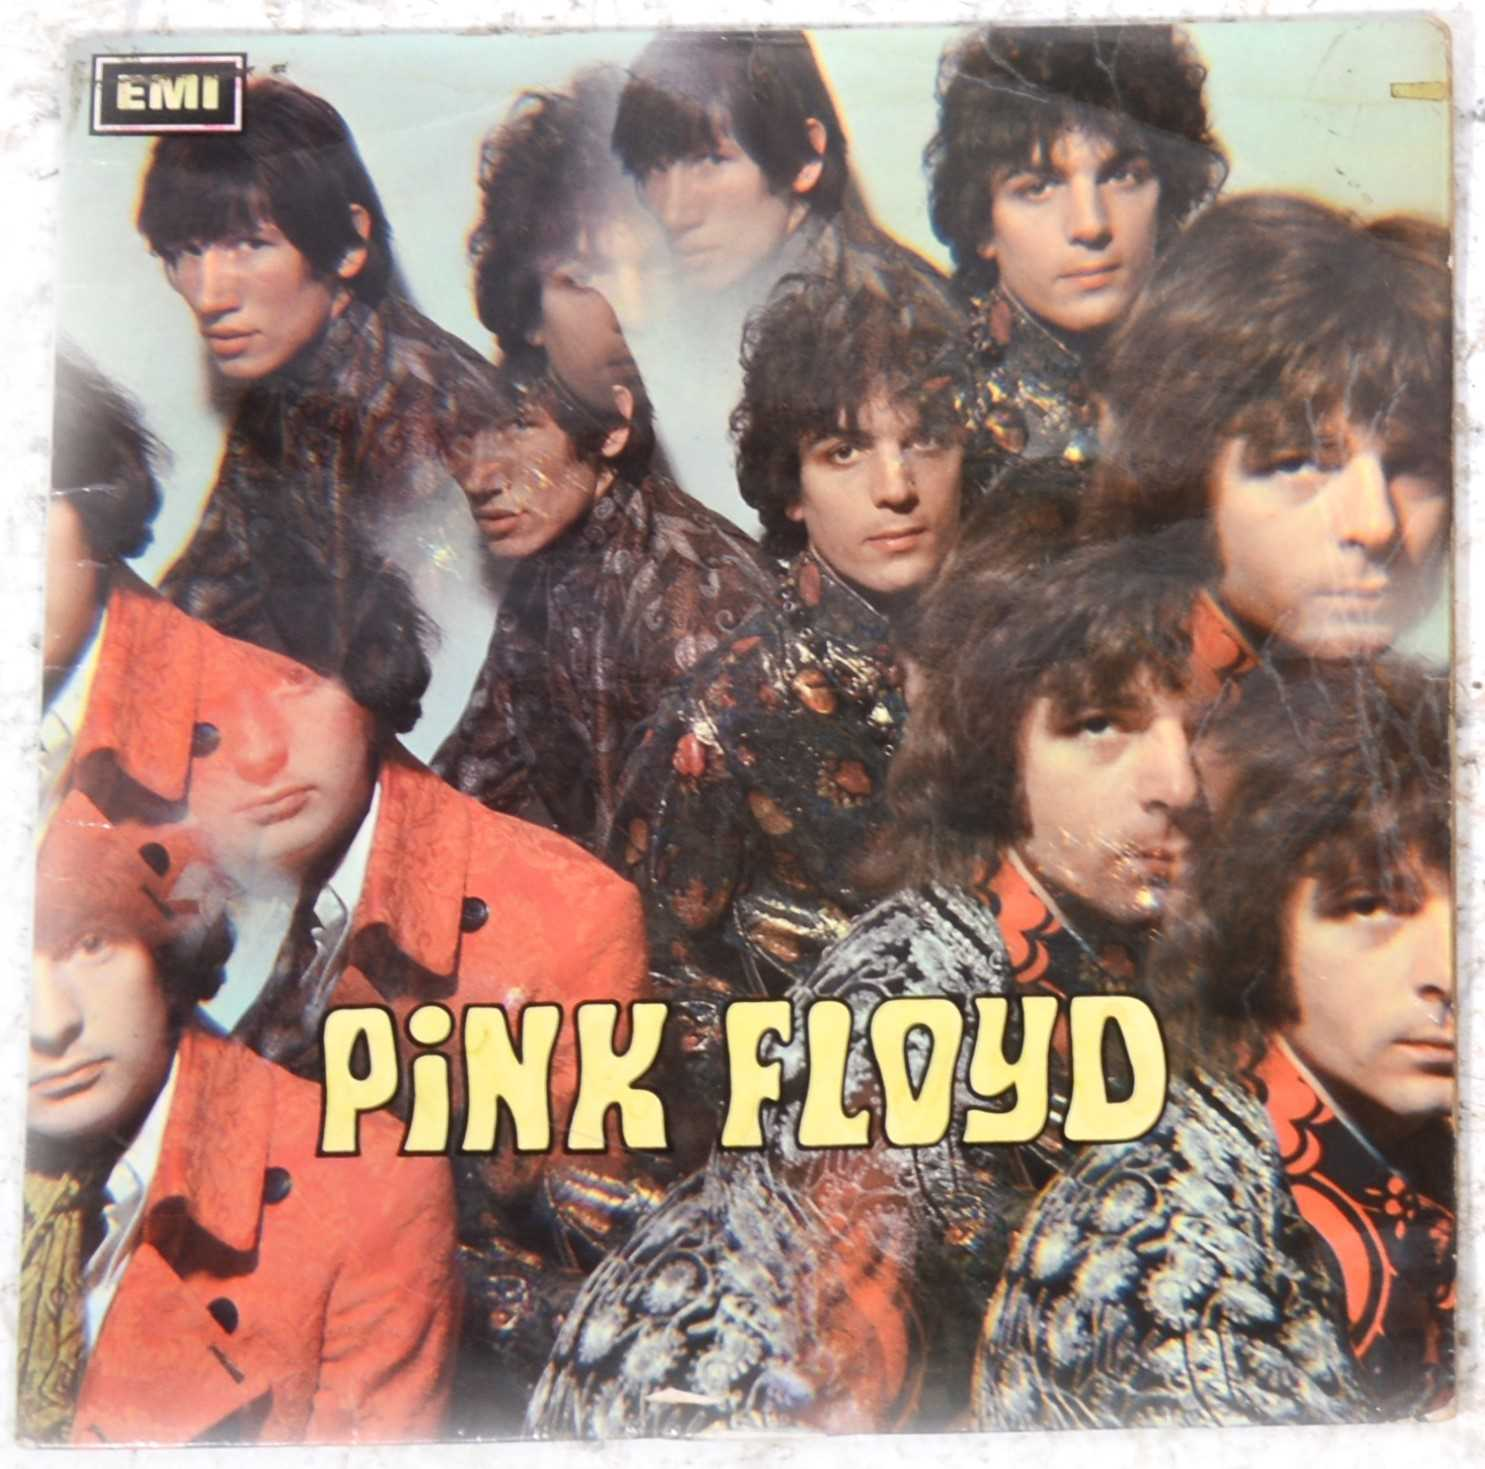 Lot 19-The Pink Floyd; The Piper at the Gates of Dawn mono SX6157 matrix XAX3419-2 / XAX3420-1.